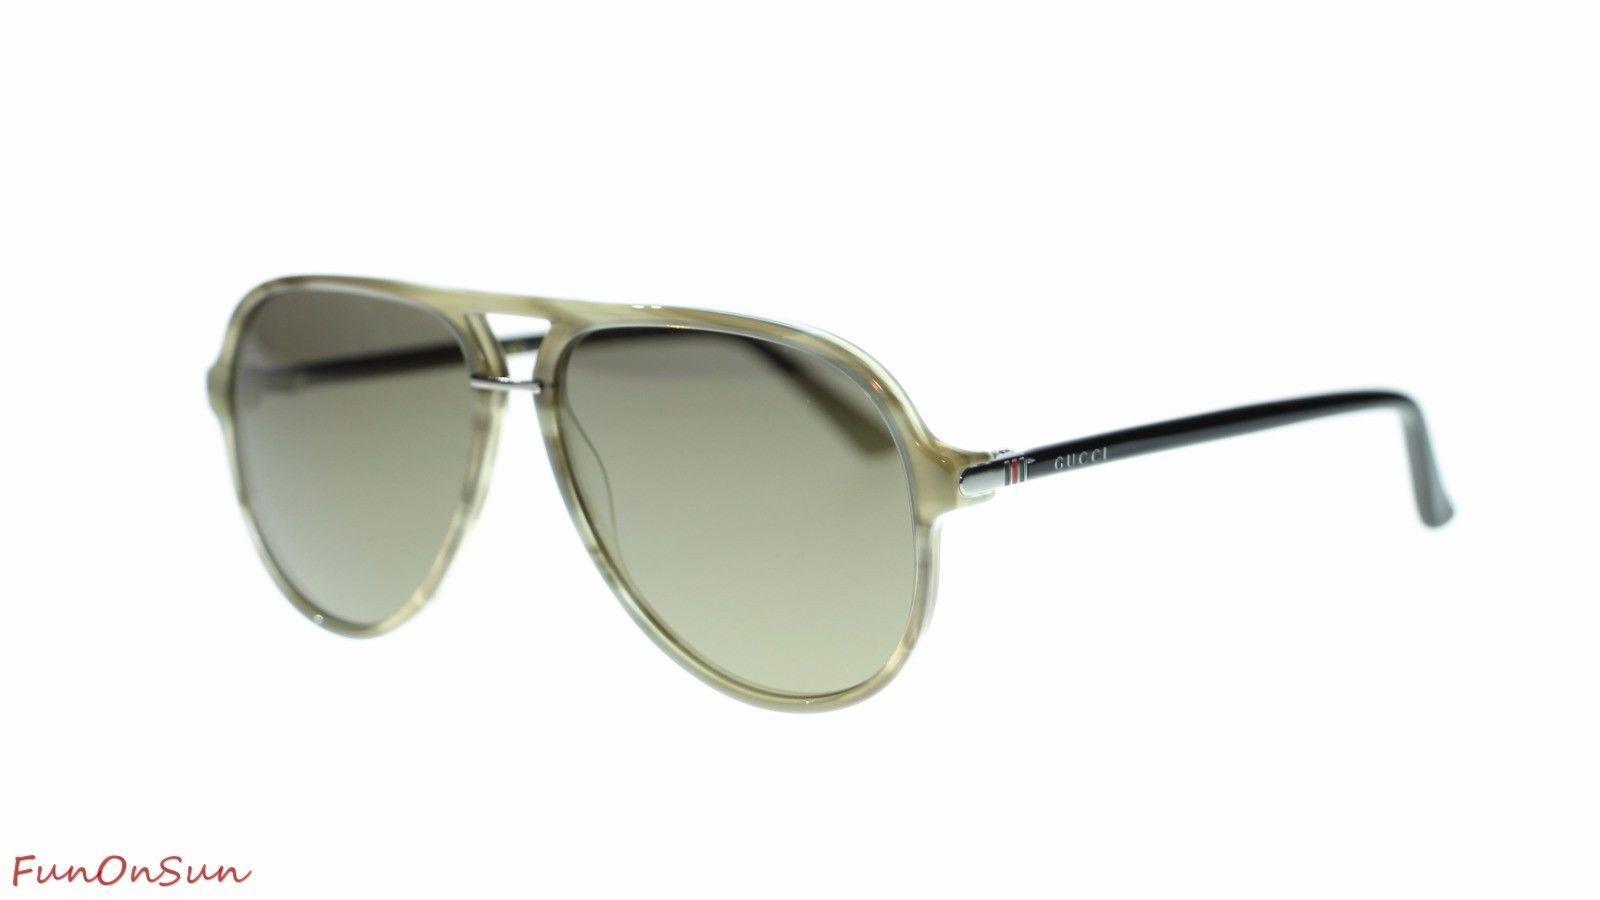 ed767be87f S l1600. S l1600. Previous. NEW Gucci Men Pilot Sunglasses GG0015 004 Havana  Black Bronze Flash Lens 58mm